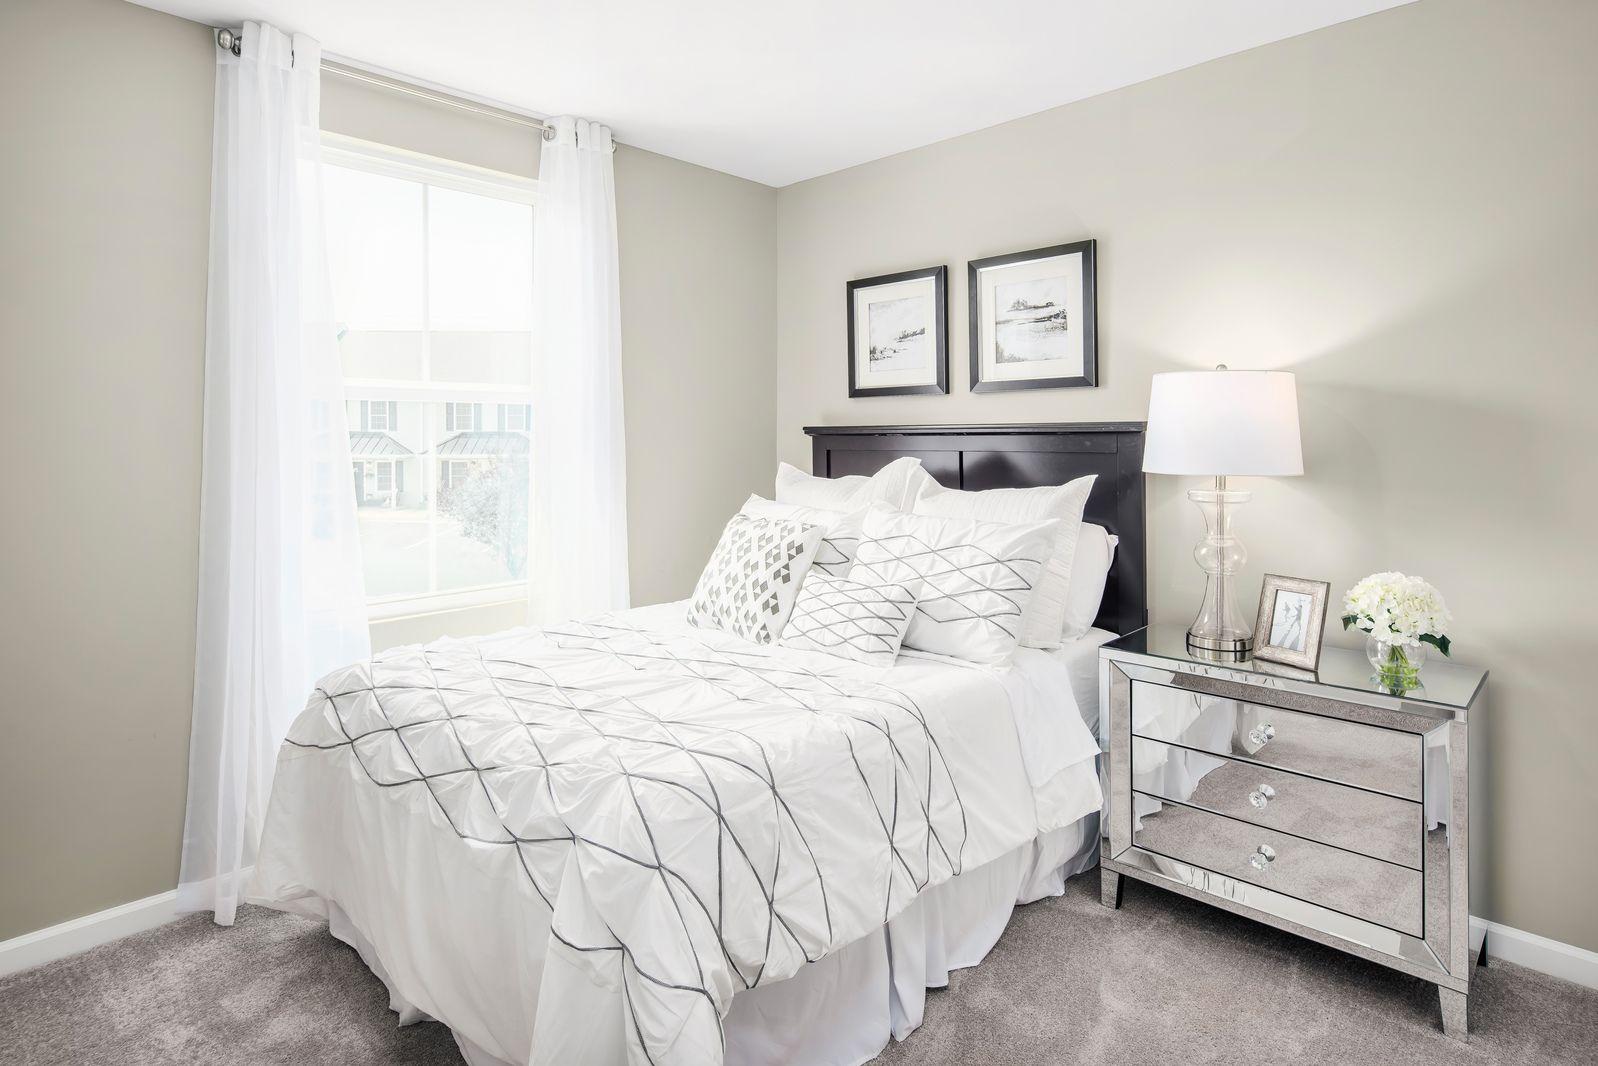 Bedroom featured in the Juniper Non Garage By Ryan Homes in Wilmington-Newark, MD